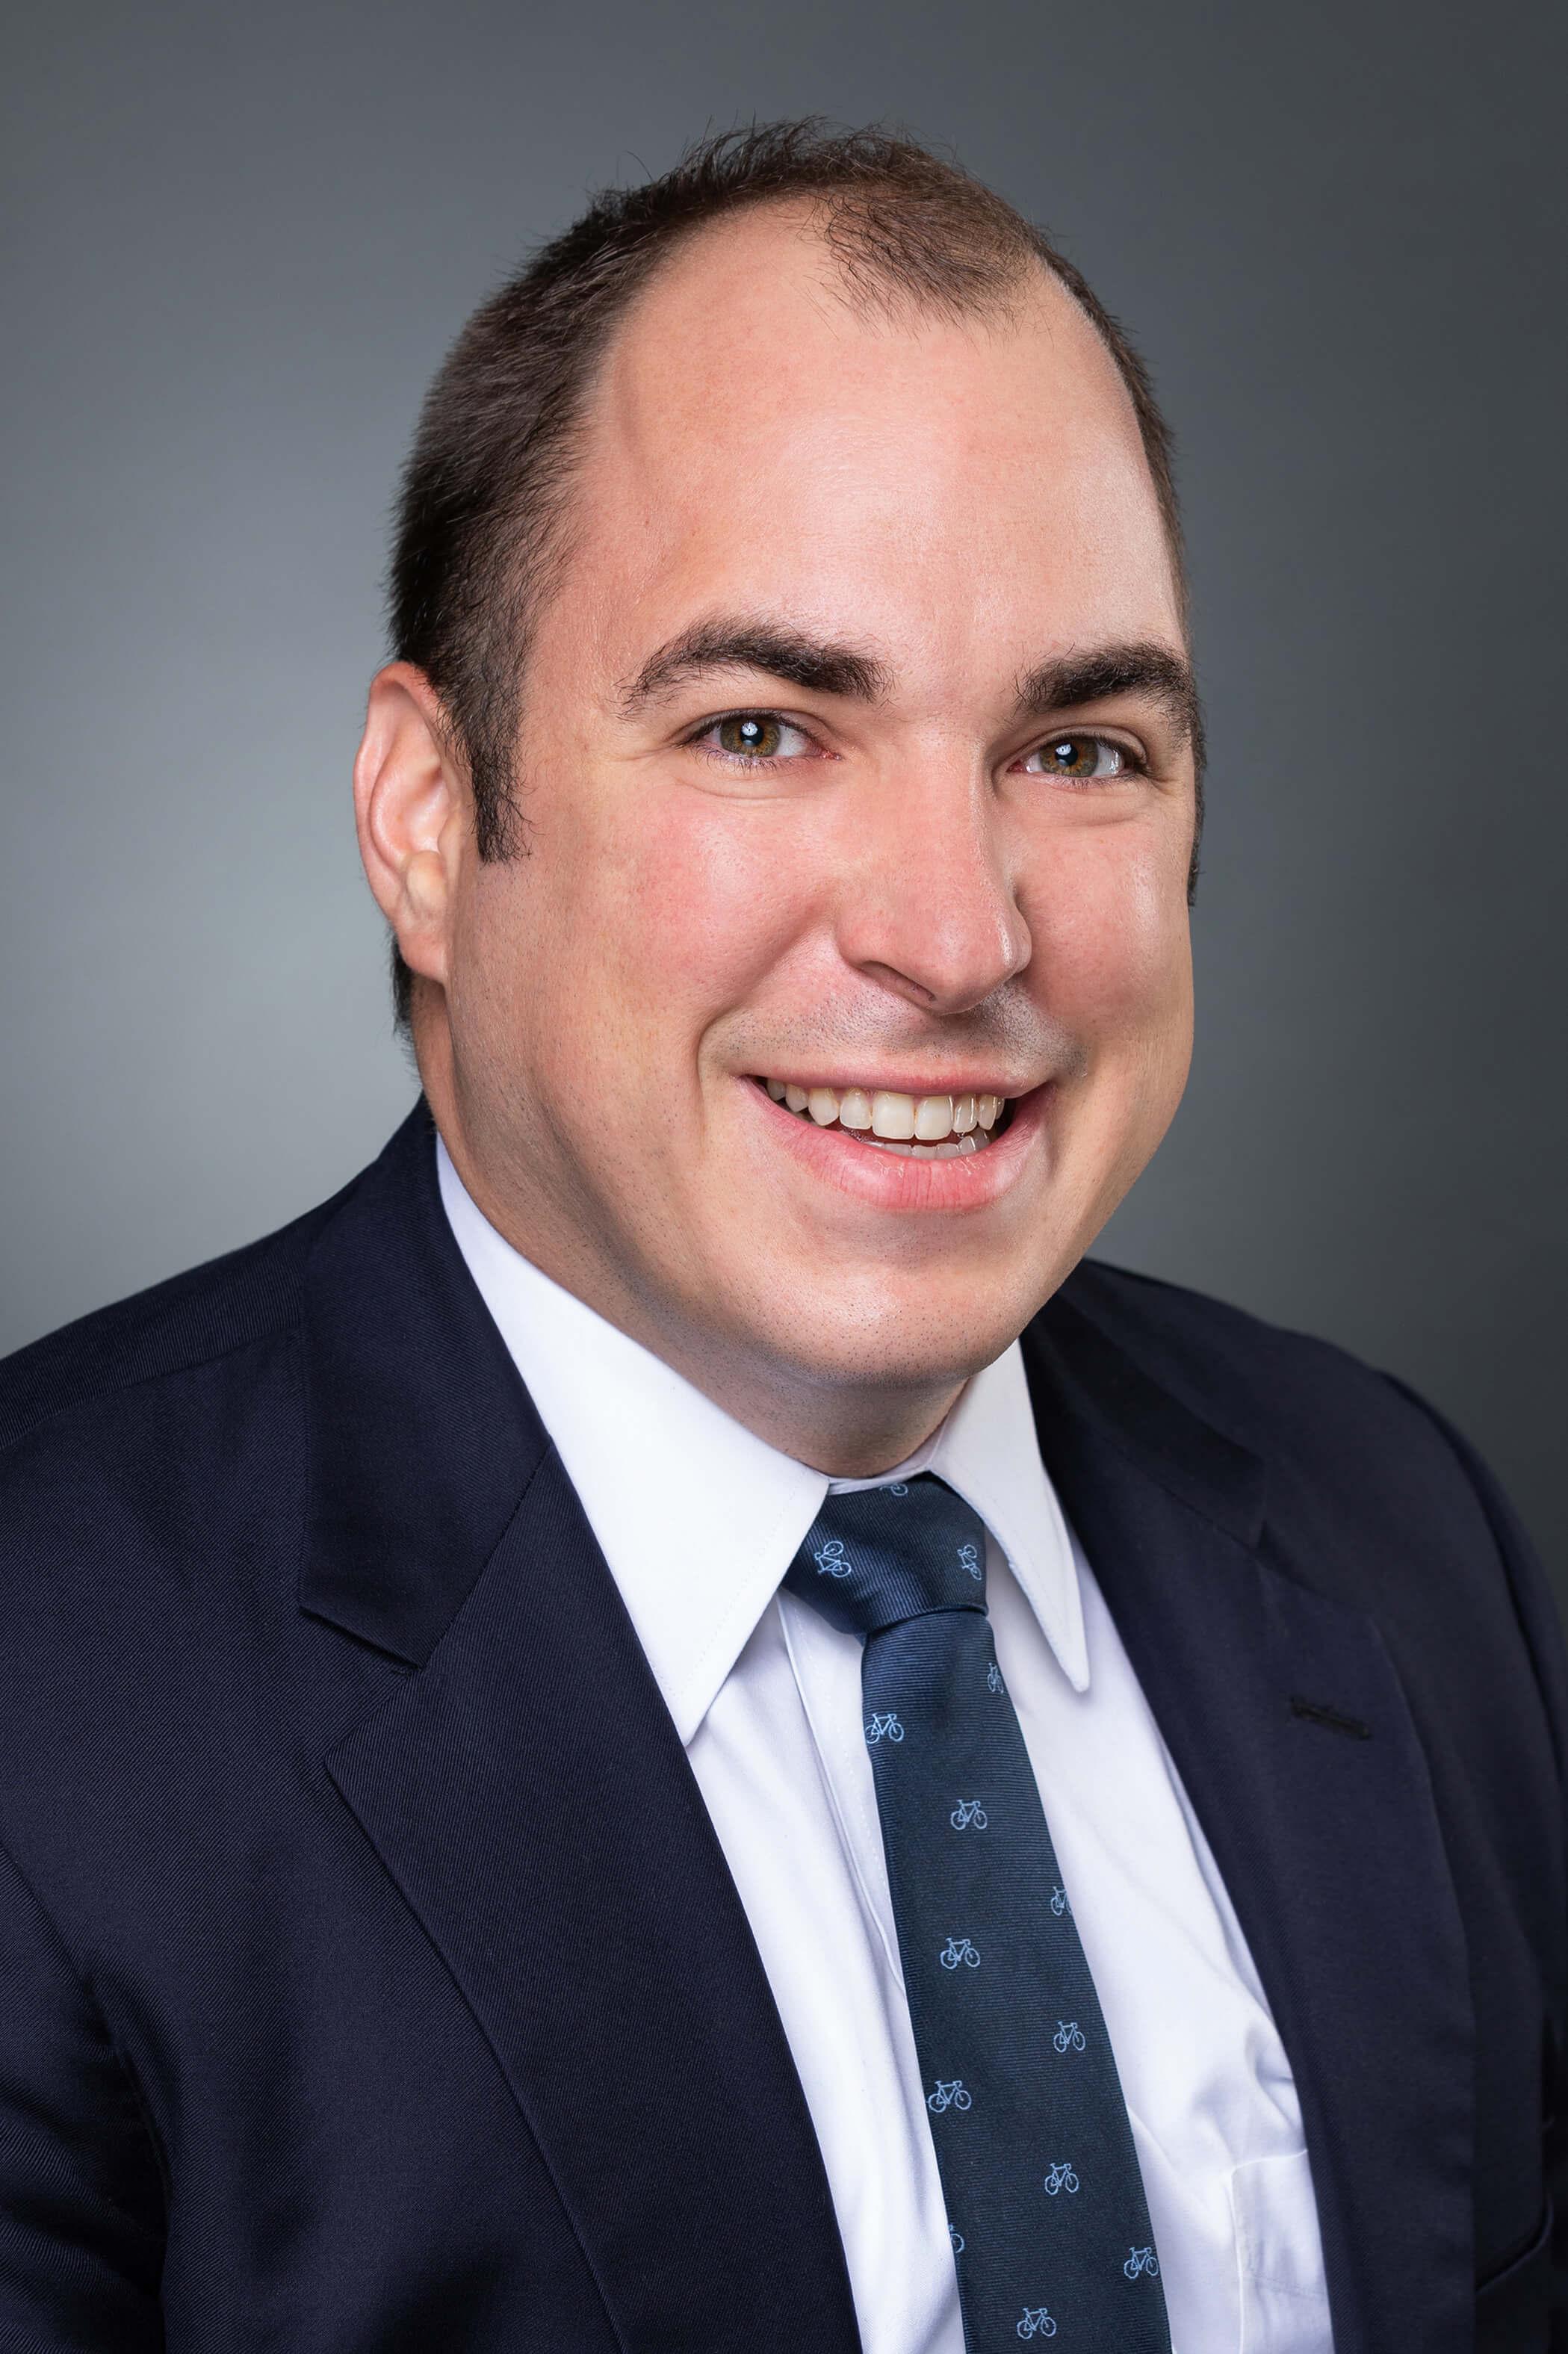 Mike DeVoll